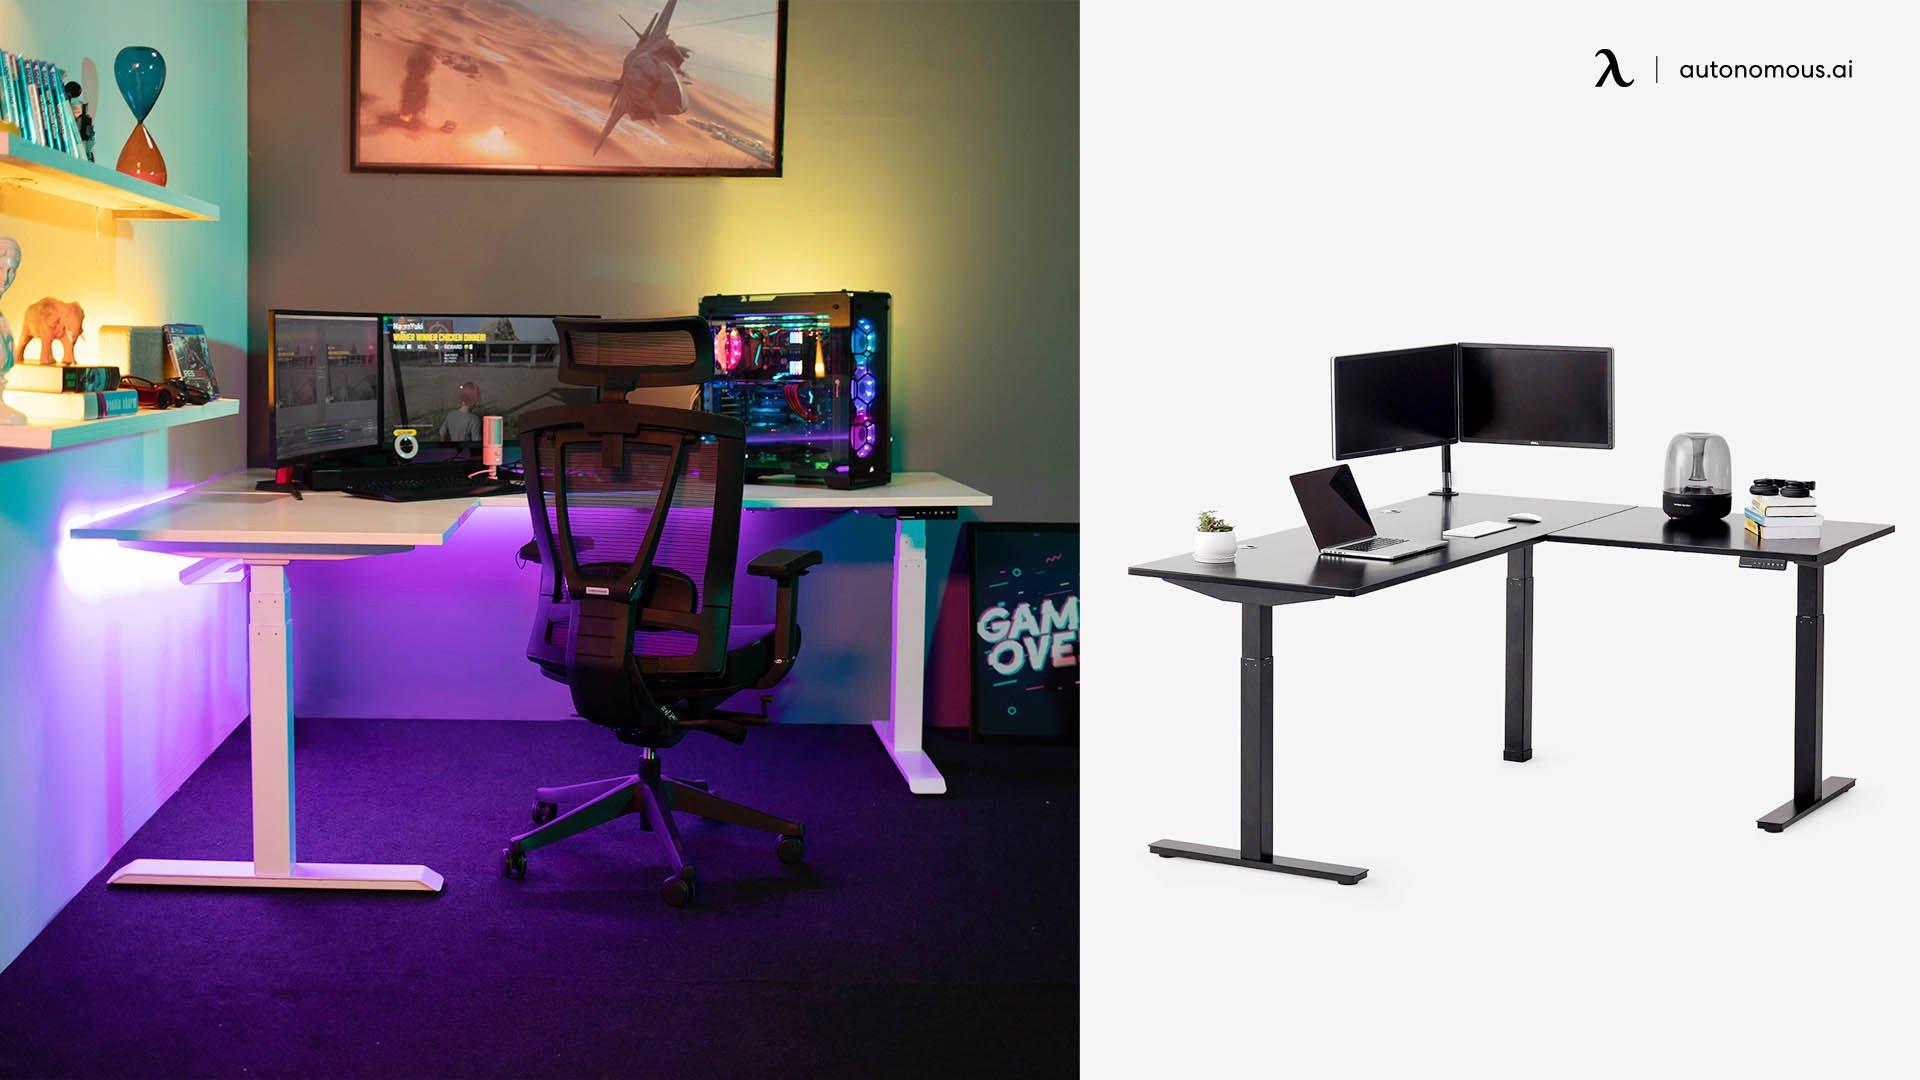 Autonomous SmartDesk – A Great Alternative to Common RGB Gaming Desks